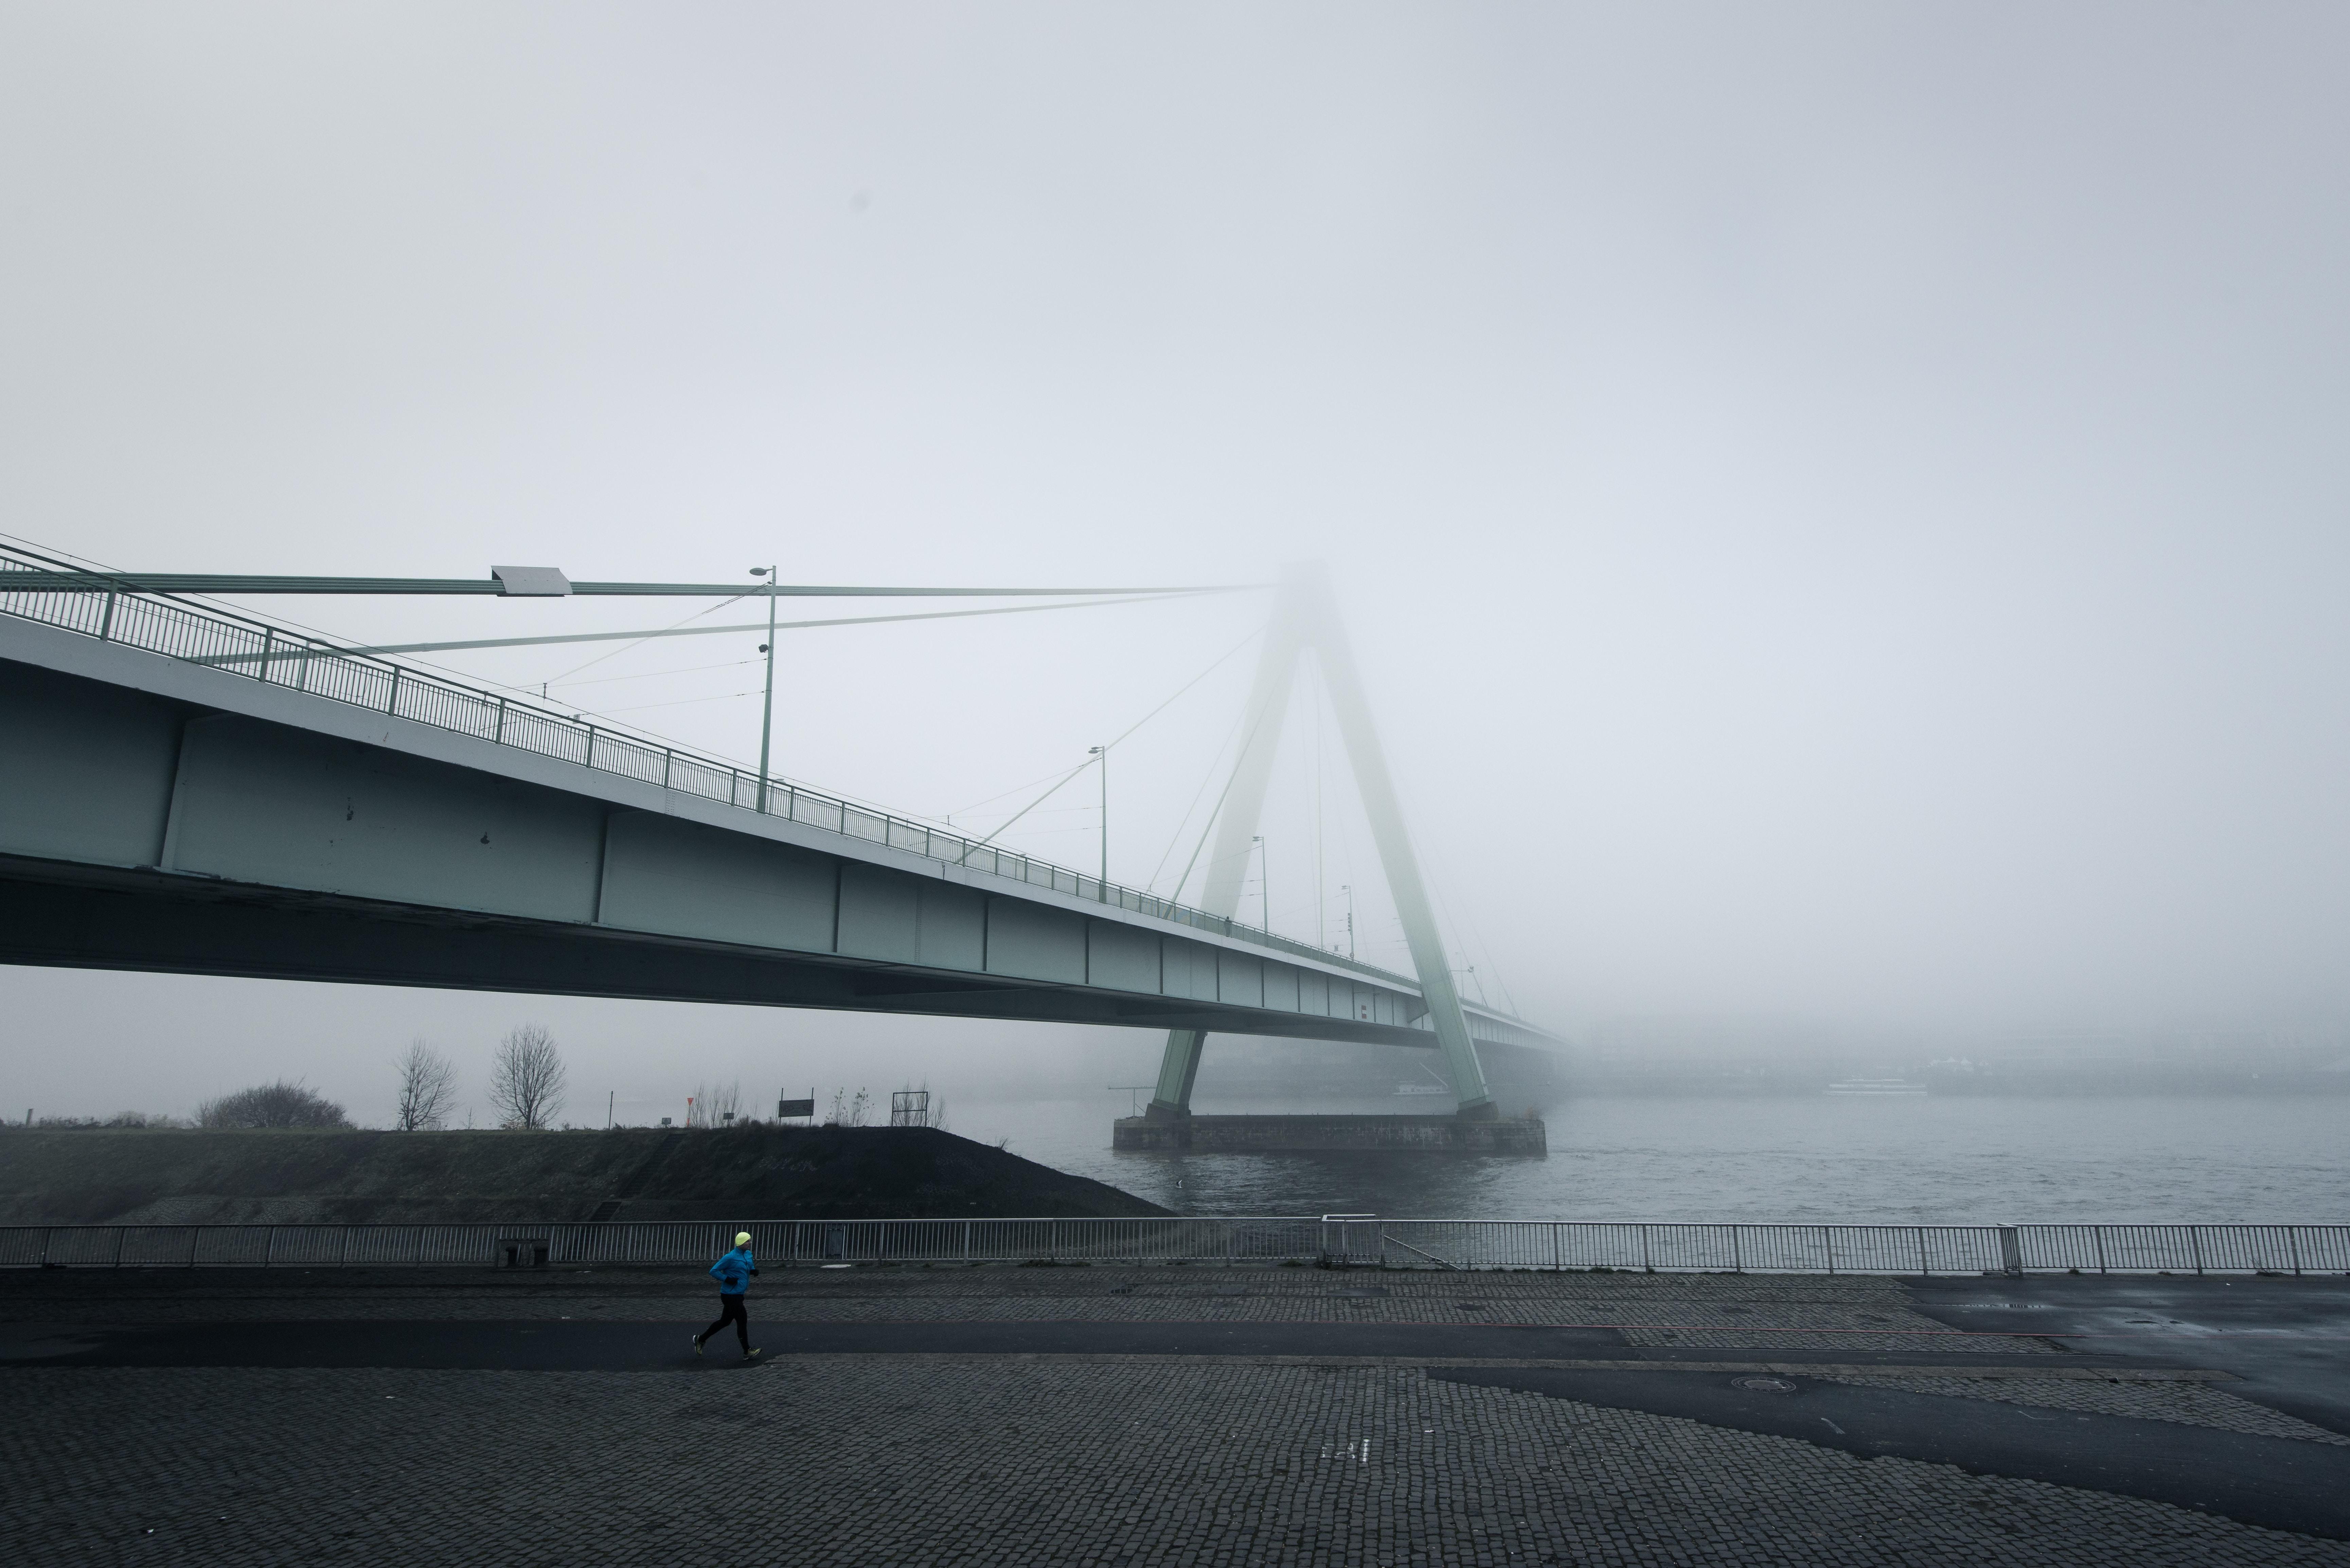 person jogging under bridge during dawn